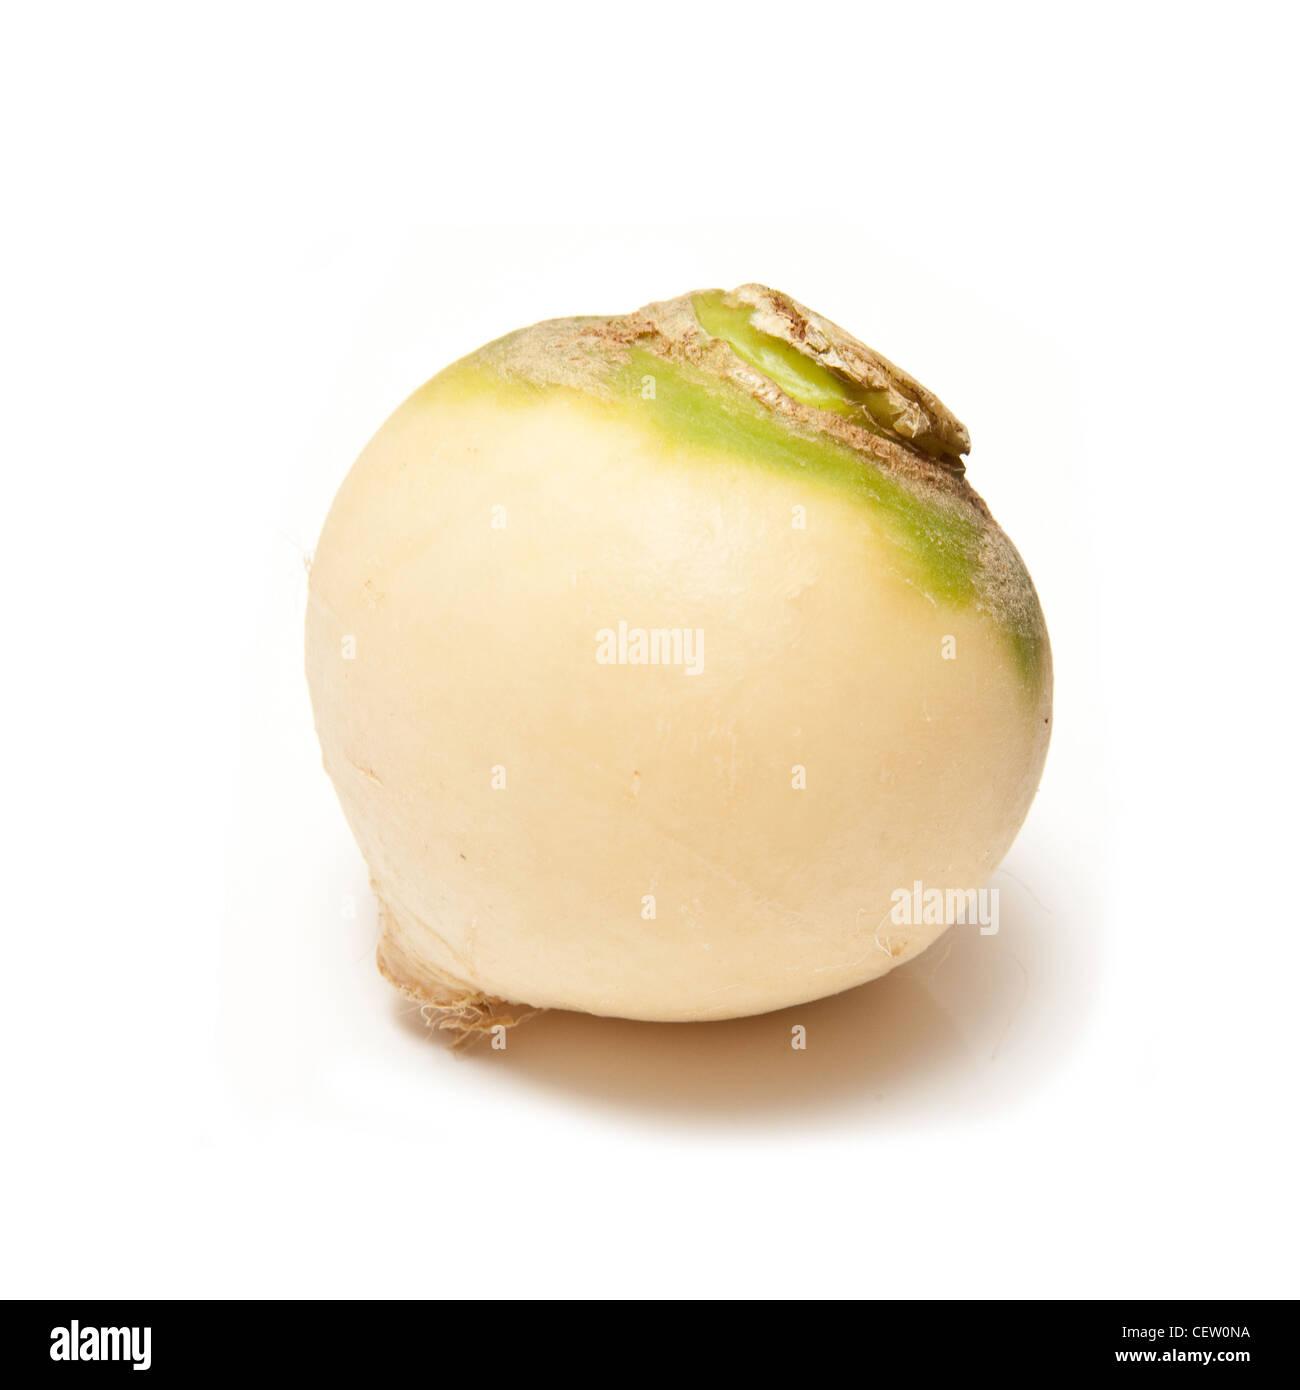 Turnip isolated on a white studio background. - Stock Image